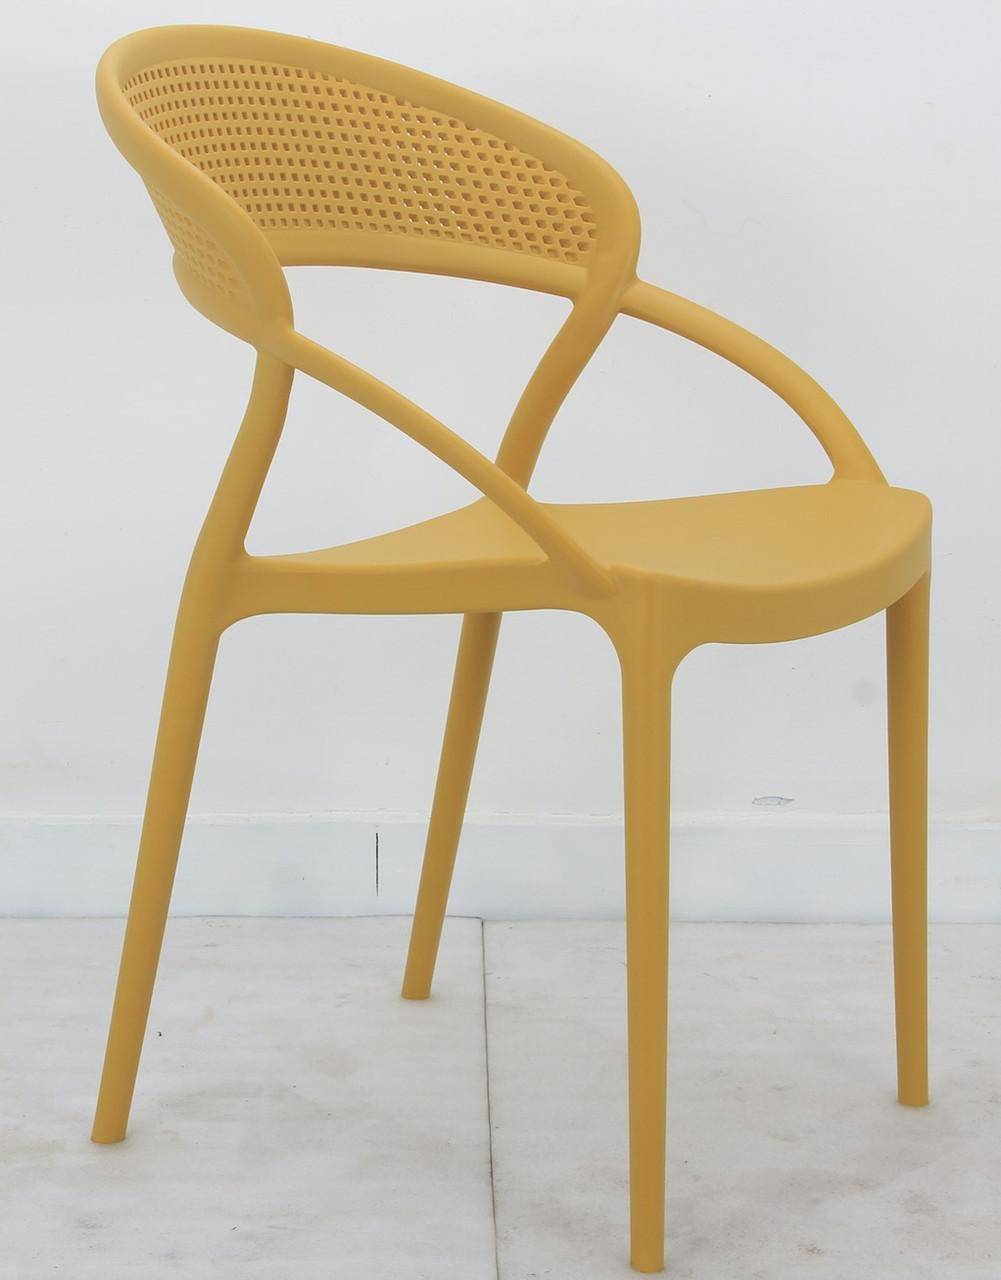 Кресло пластиковое цельнолитое желтое Nelson